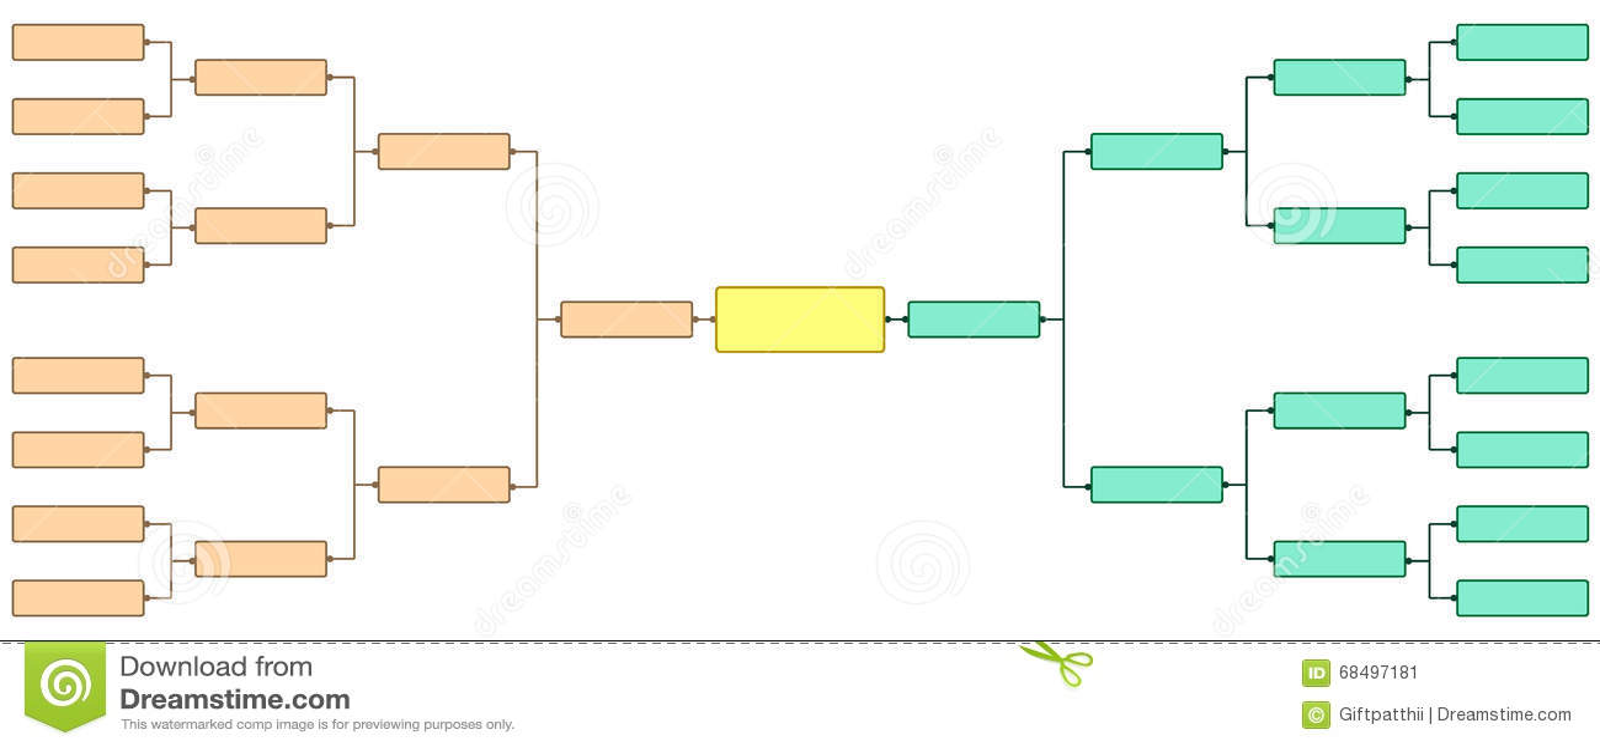 Bracket Tournament 16 Stock Vector Illustration Of Great 68497181